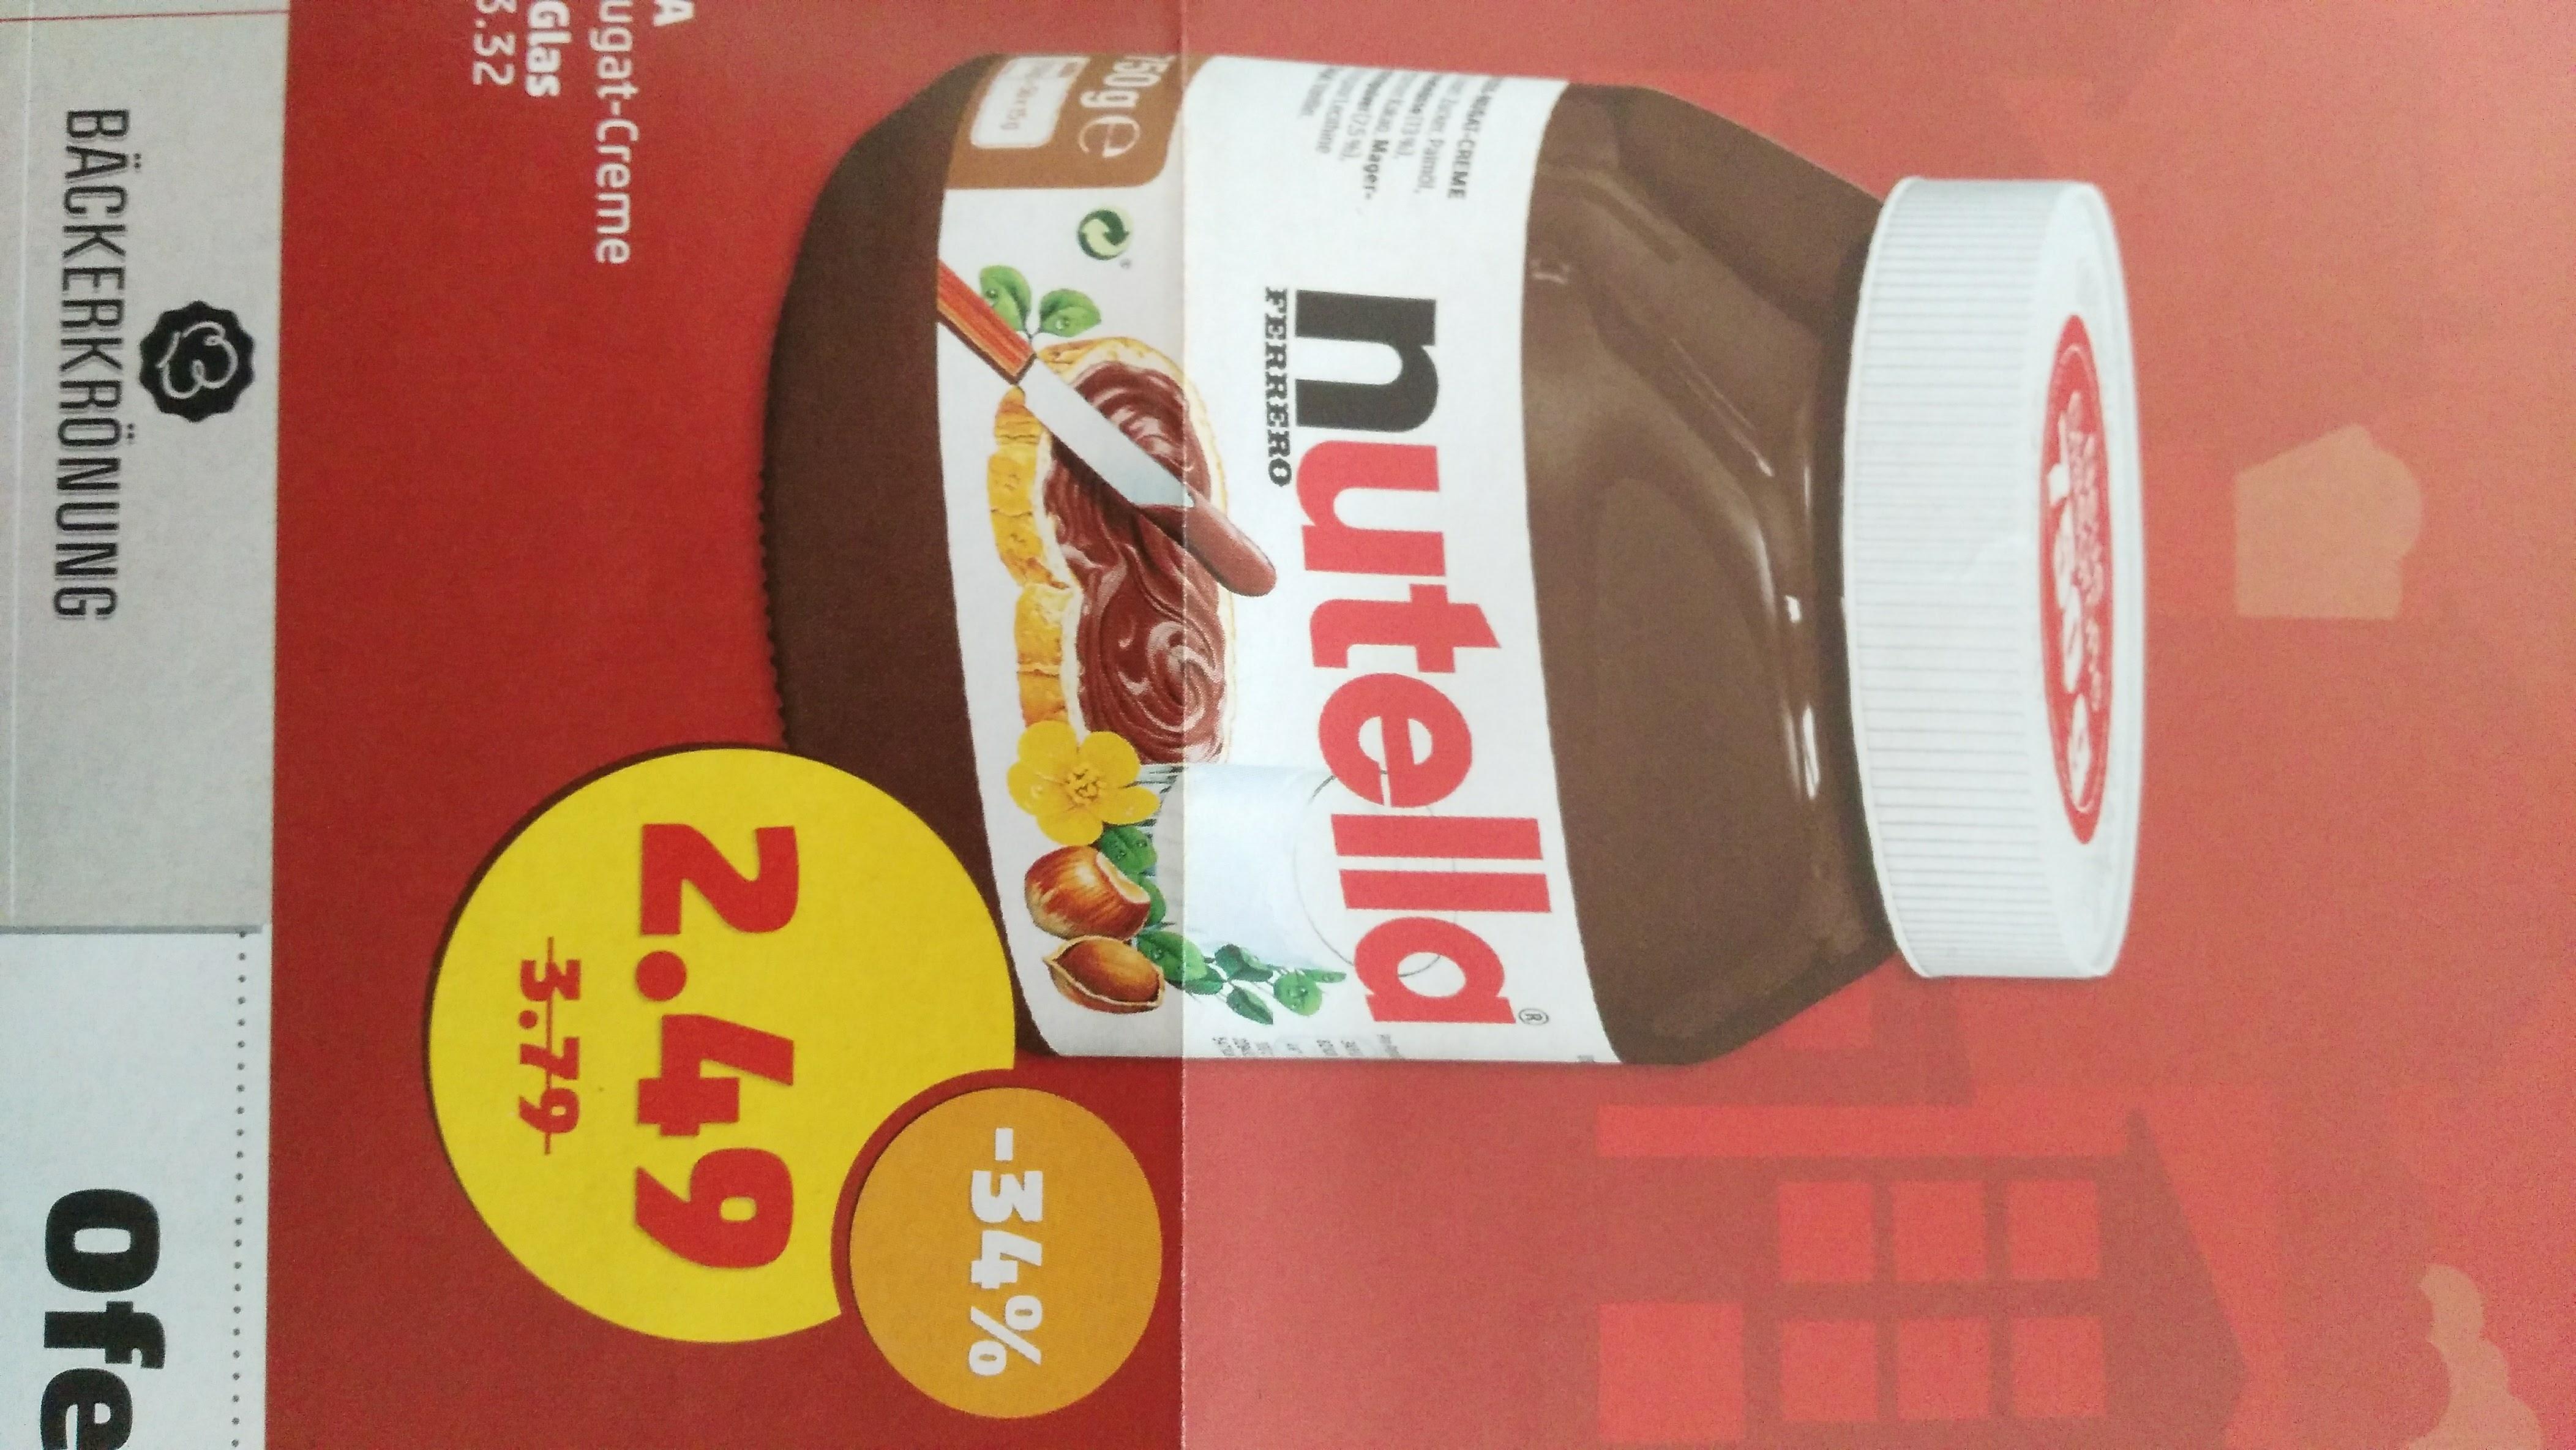 Nutella 2,49 Euro für 750 Gramm, Havana Club 8,88 Euro usw. lokal Hamburg Bramfeld